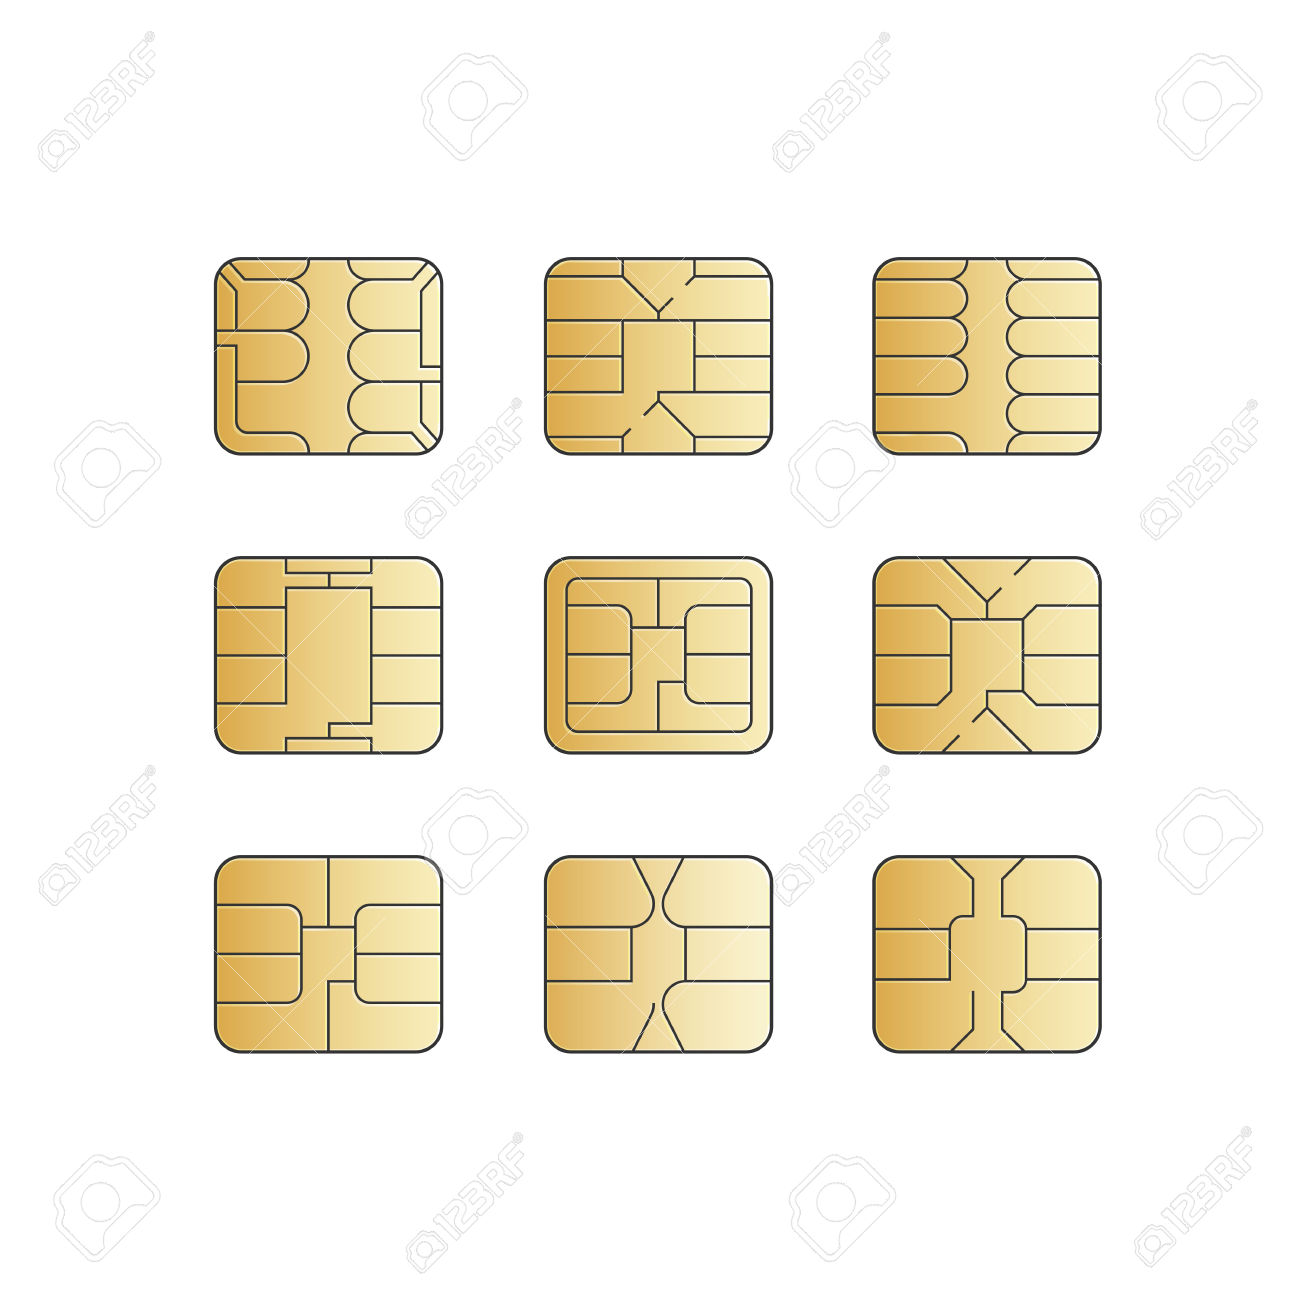 Vector Mobile Cellular Phone Sim Card Chip Set Royalty Free.